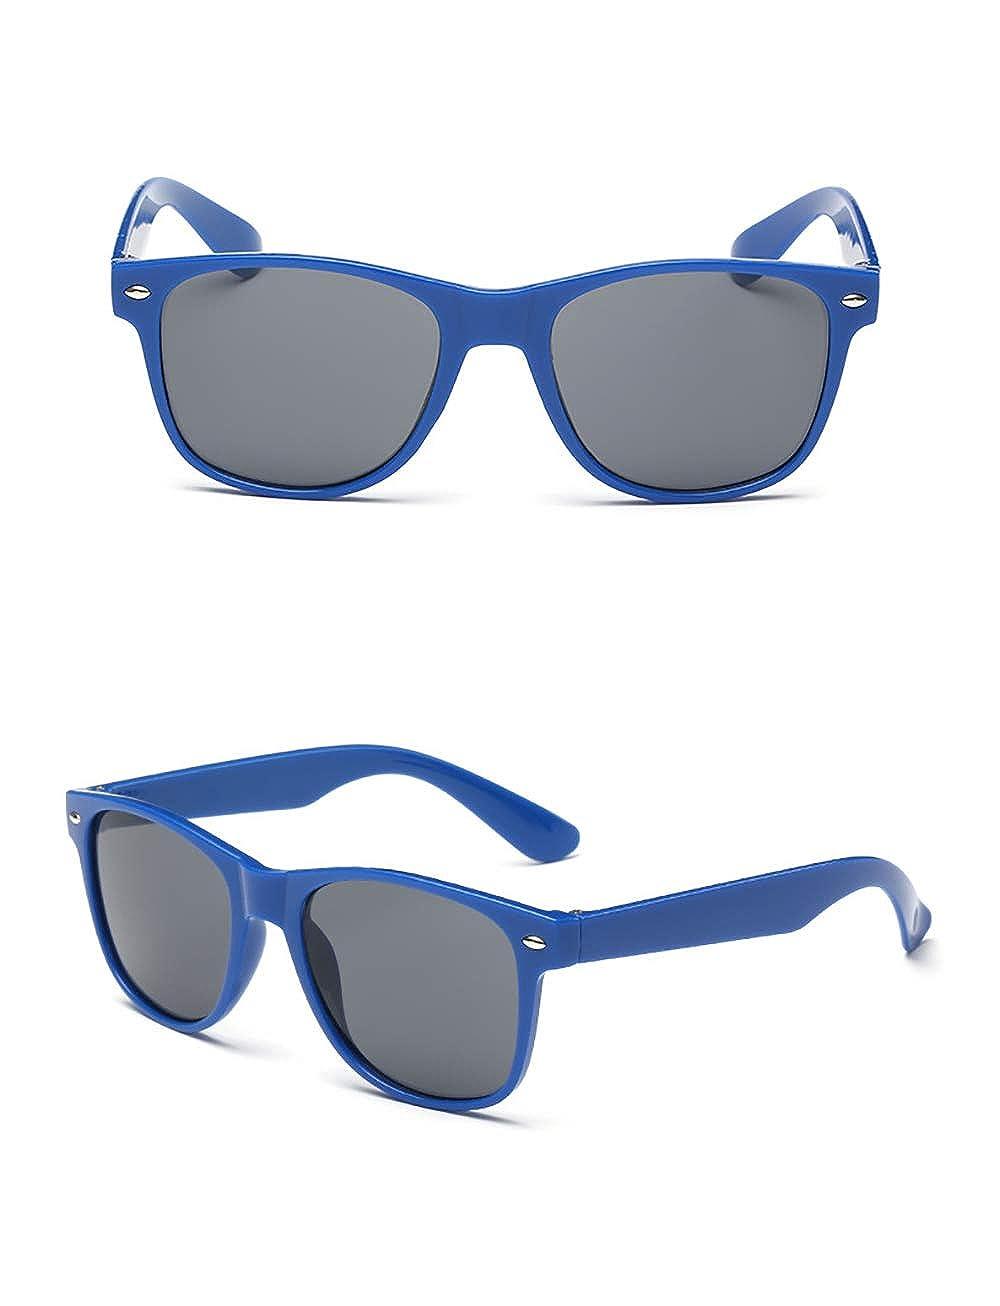 ruhation Fashion Classic Style Sunglasses for Men Women Sun Glasses Gafas Oculos de sol 50mm